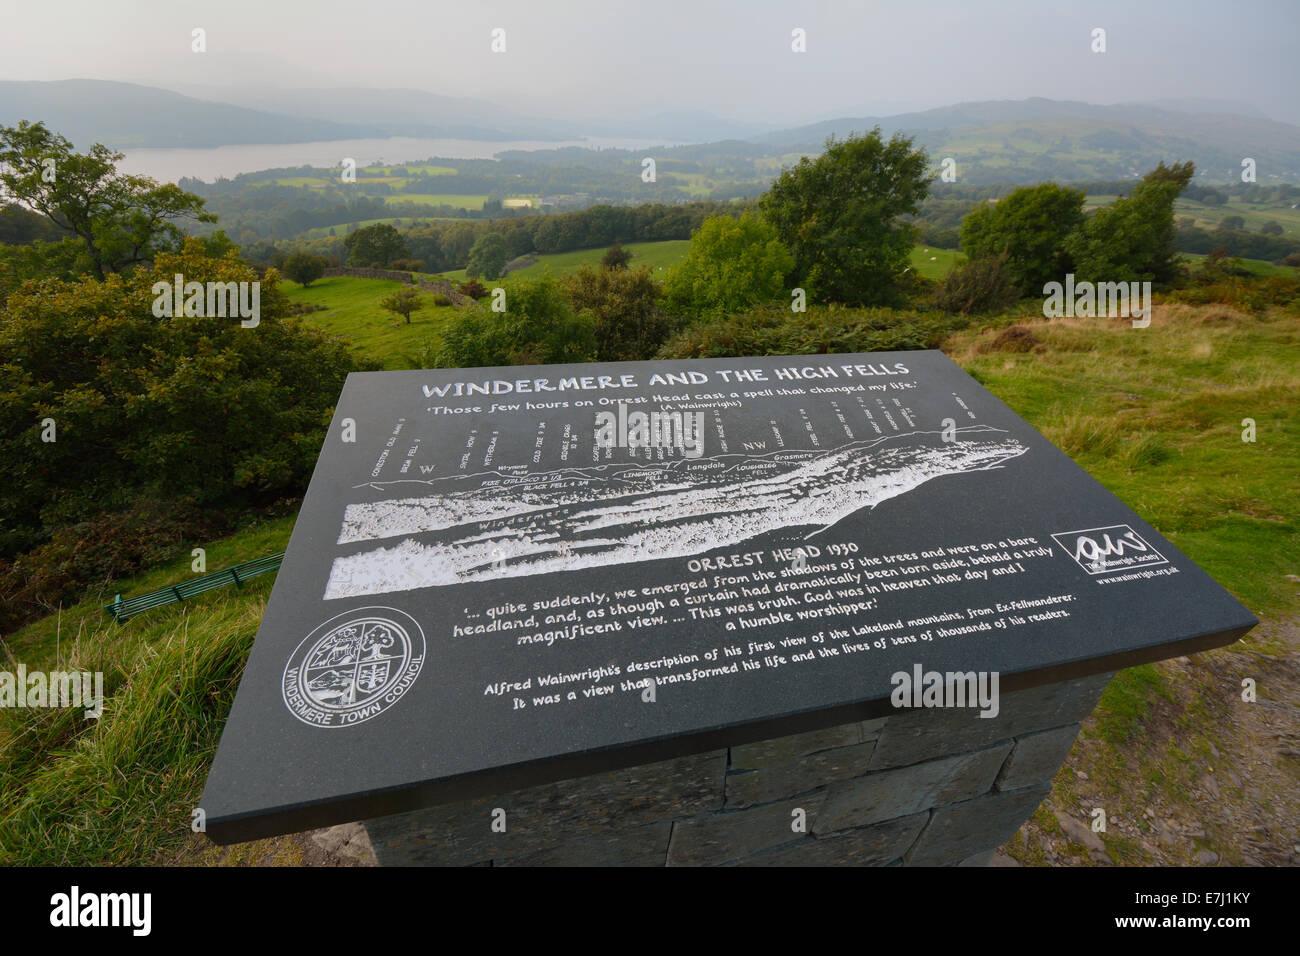 Orrest Head viewpoint, Windermere, Cumbria, UK - Stock Image